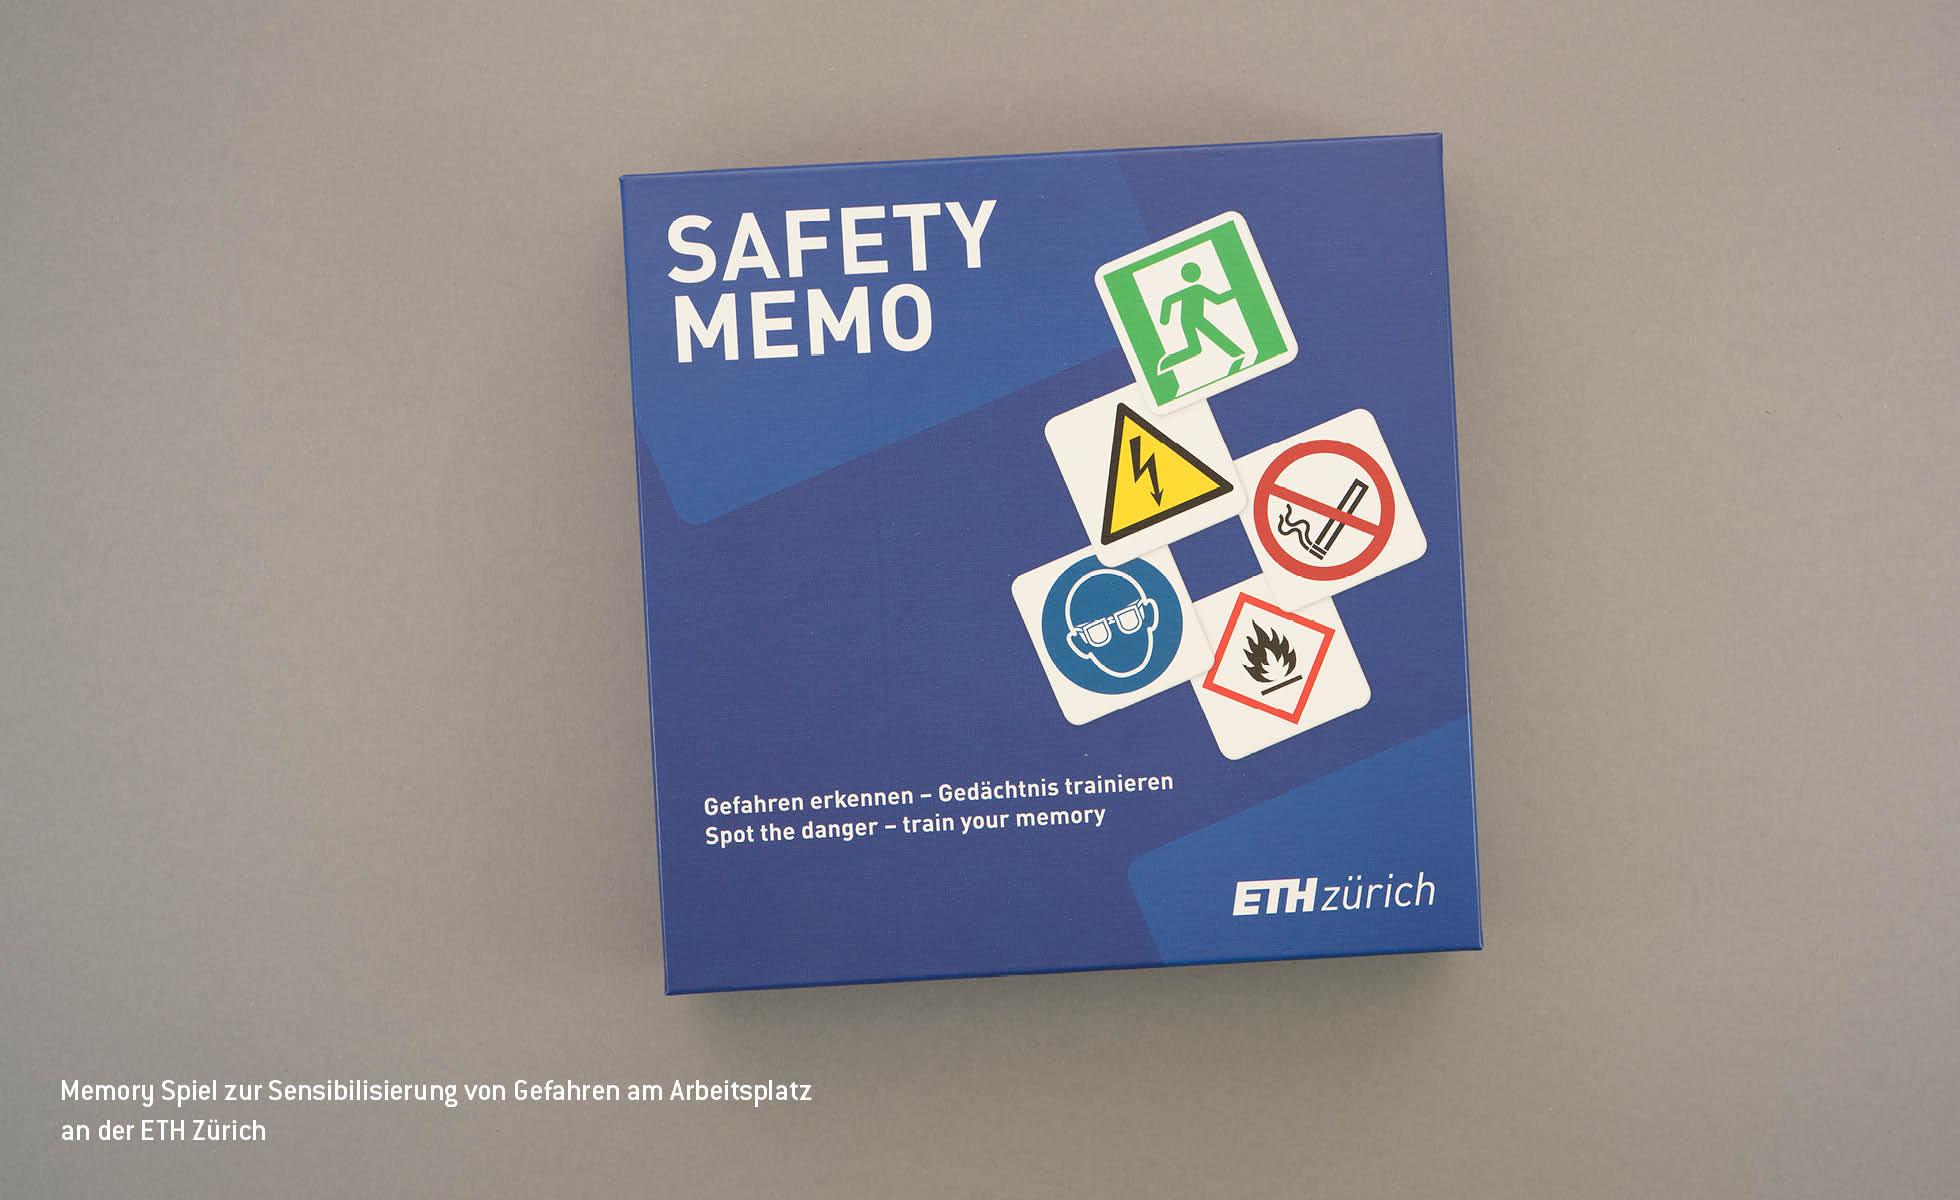 diverses_safety_memo_ETH_01.jpg